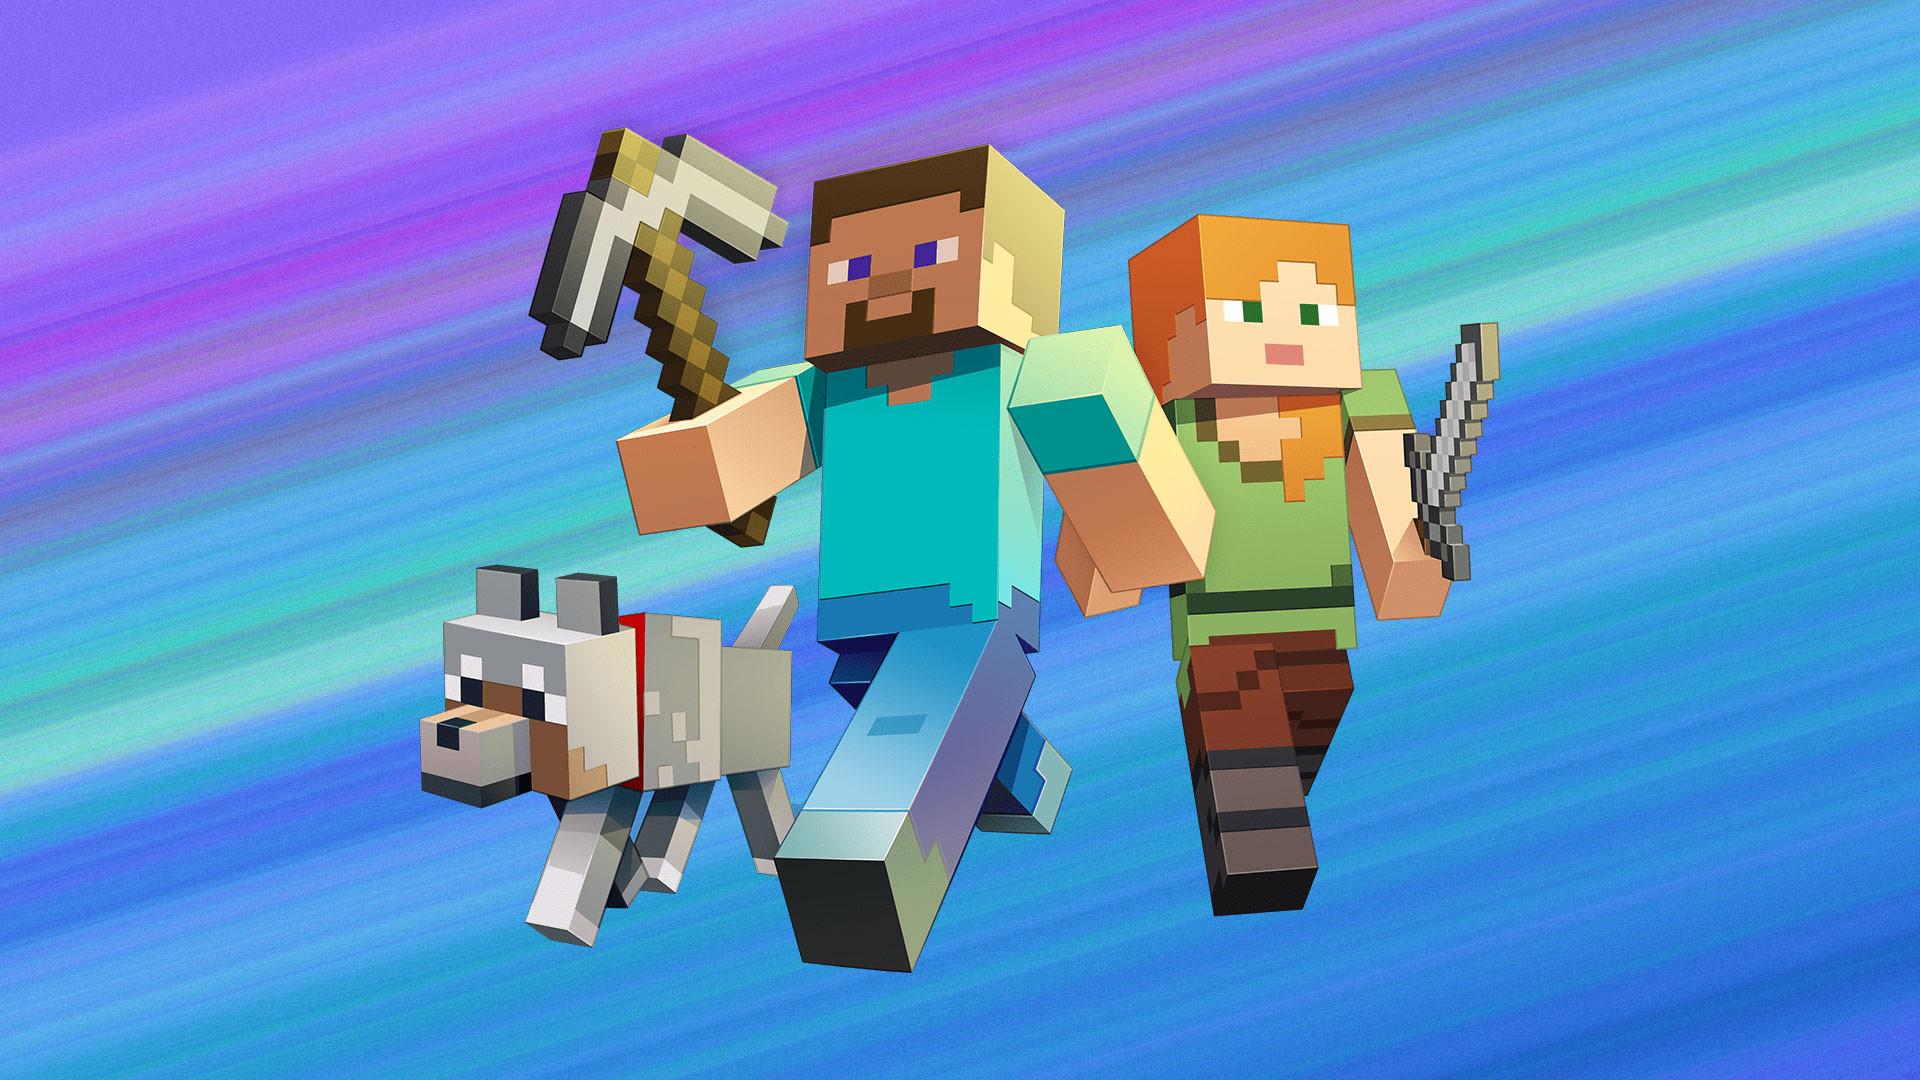 <p><span>Фото: &copy;&nbsp;Minecraft</span></p>